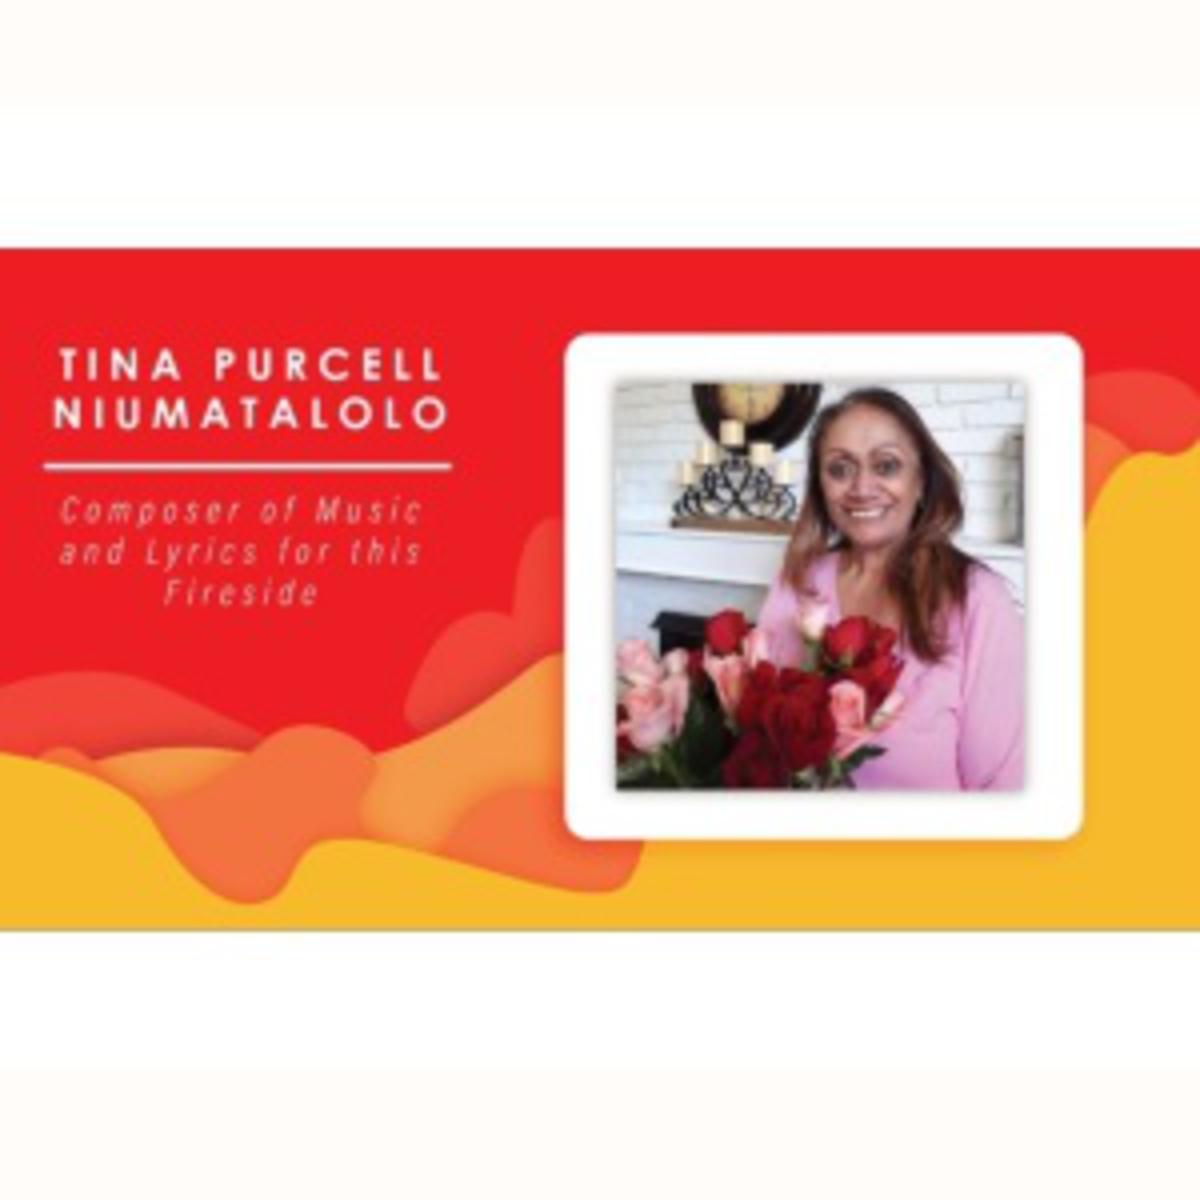 Tina Purcell Niumatalolo